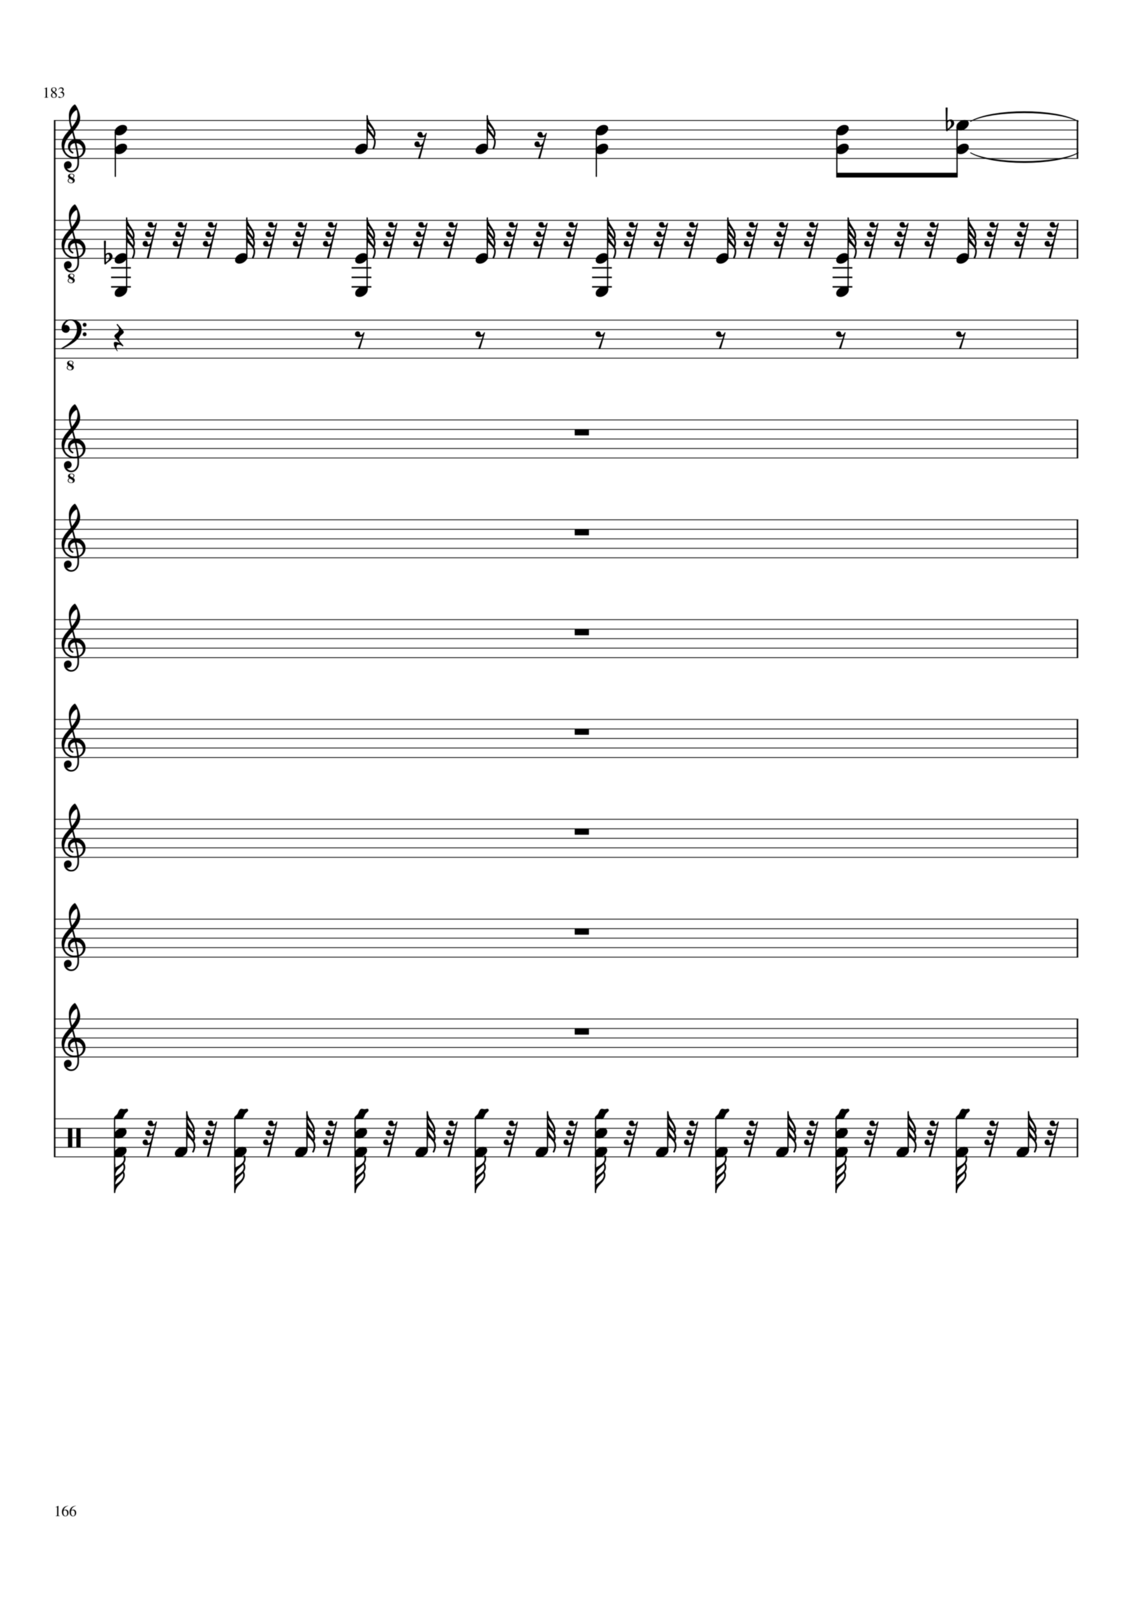 Belyiy sokol slide, Image 166